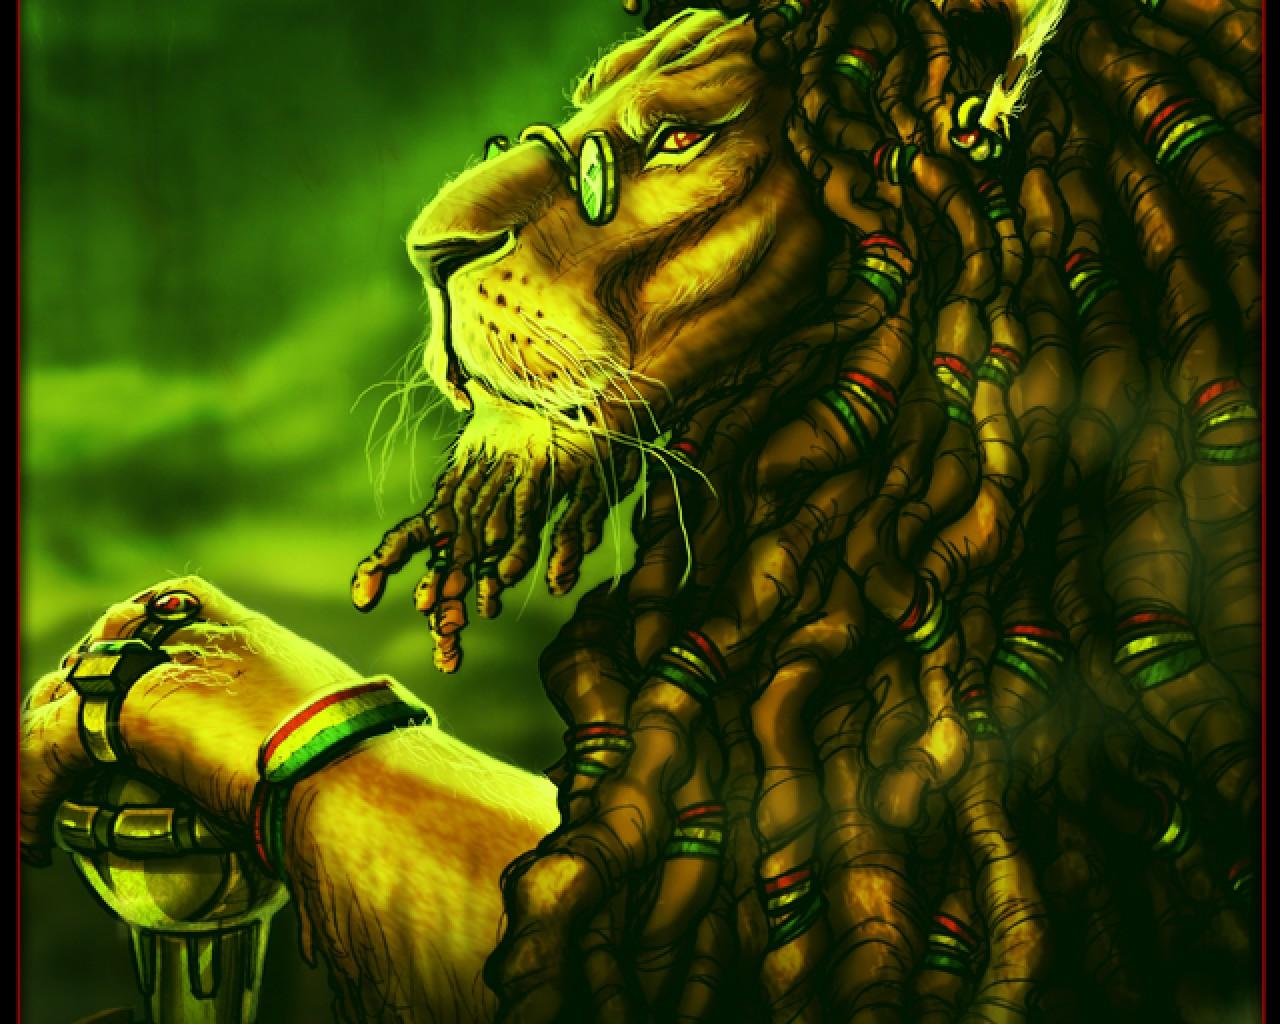 Trippy Rasta Lion 89017 Loadtve